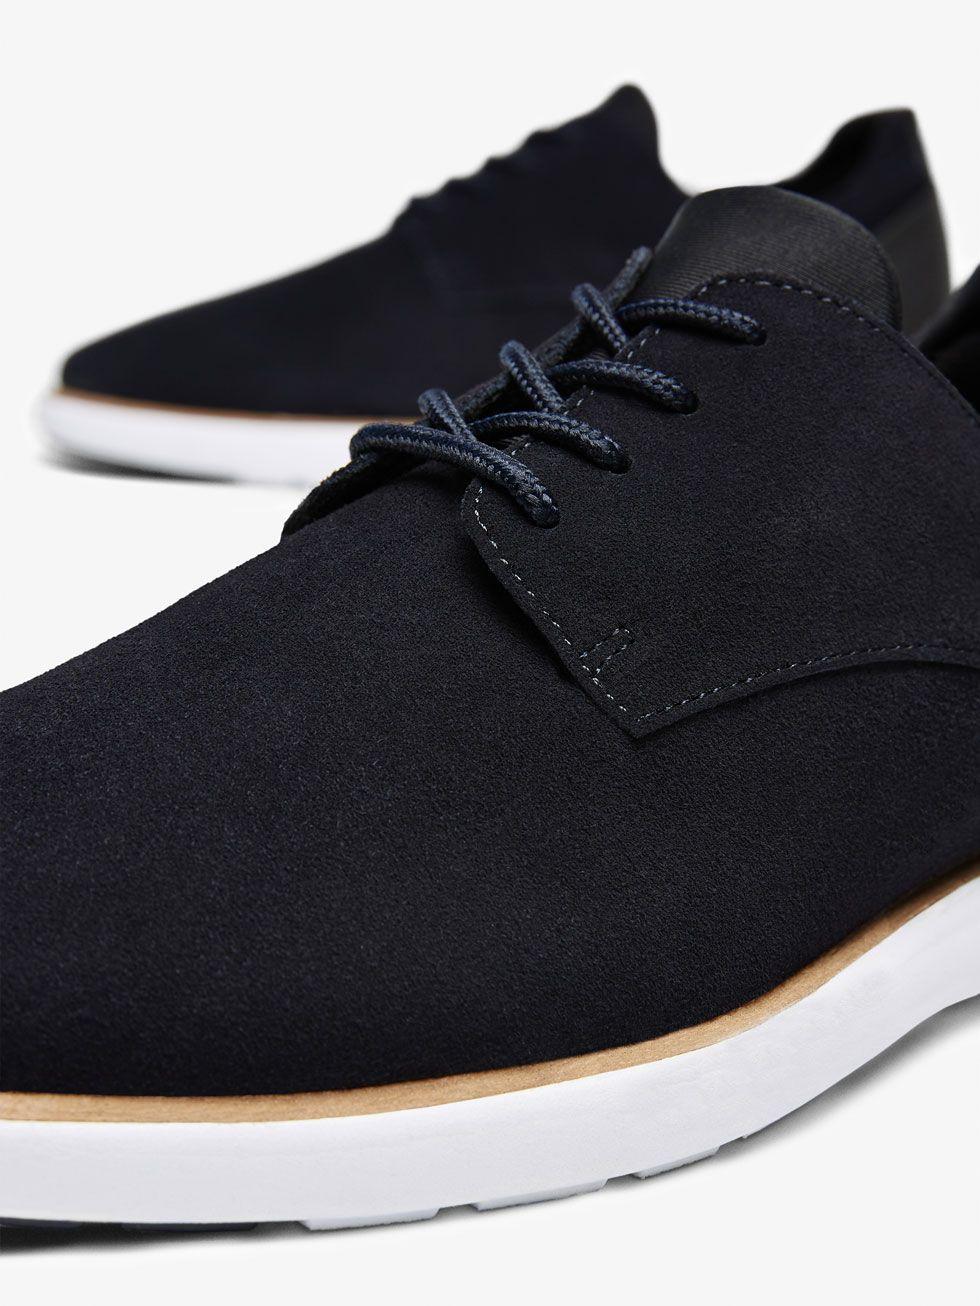 De Serraje Deportivo Hombre Ver Todo Piel Zapatos Azul Ygybf67